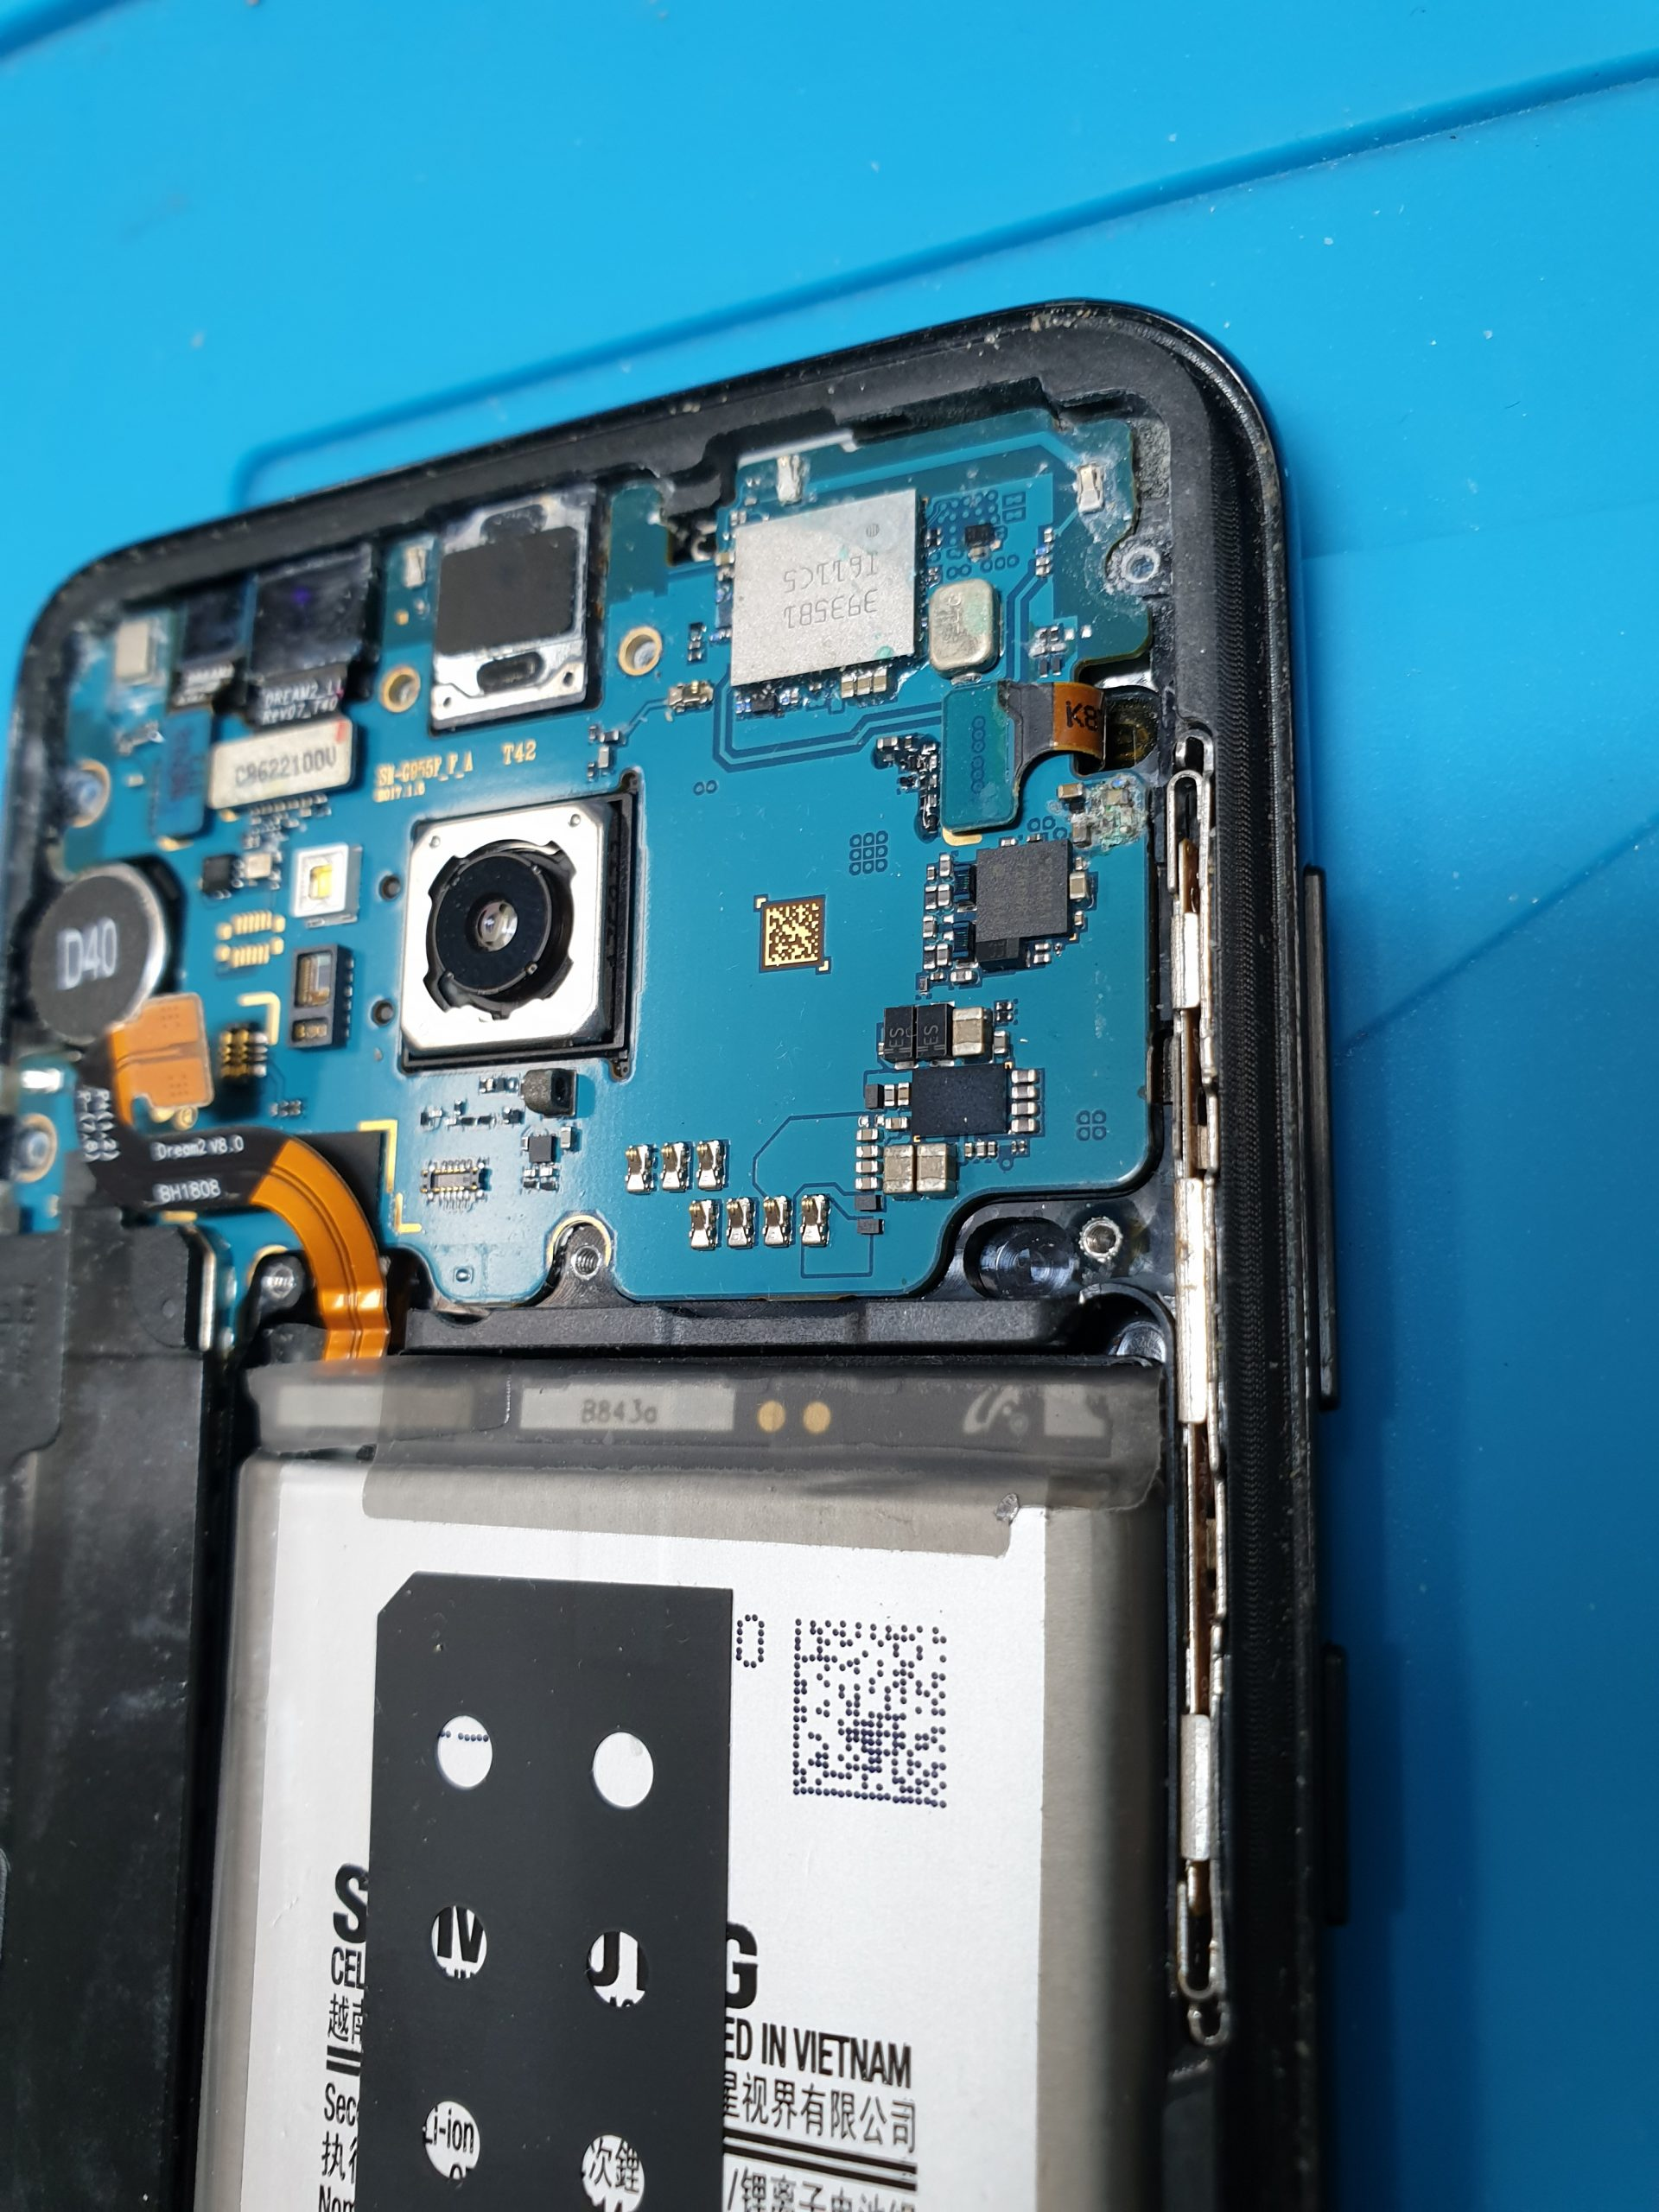 Samsung Galaxy Phone Liquid Damage Repair